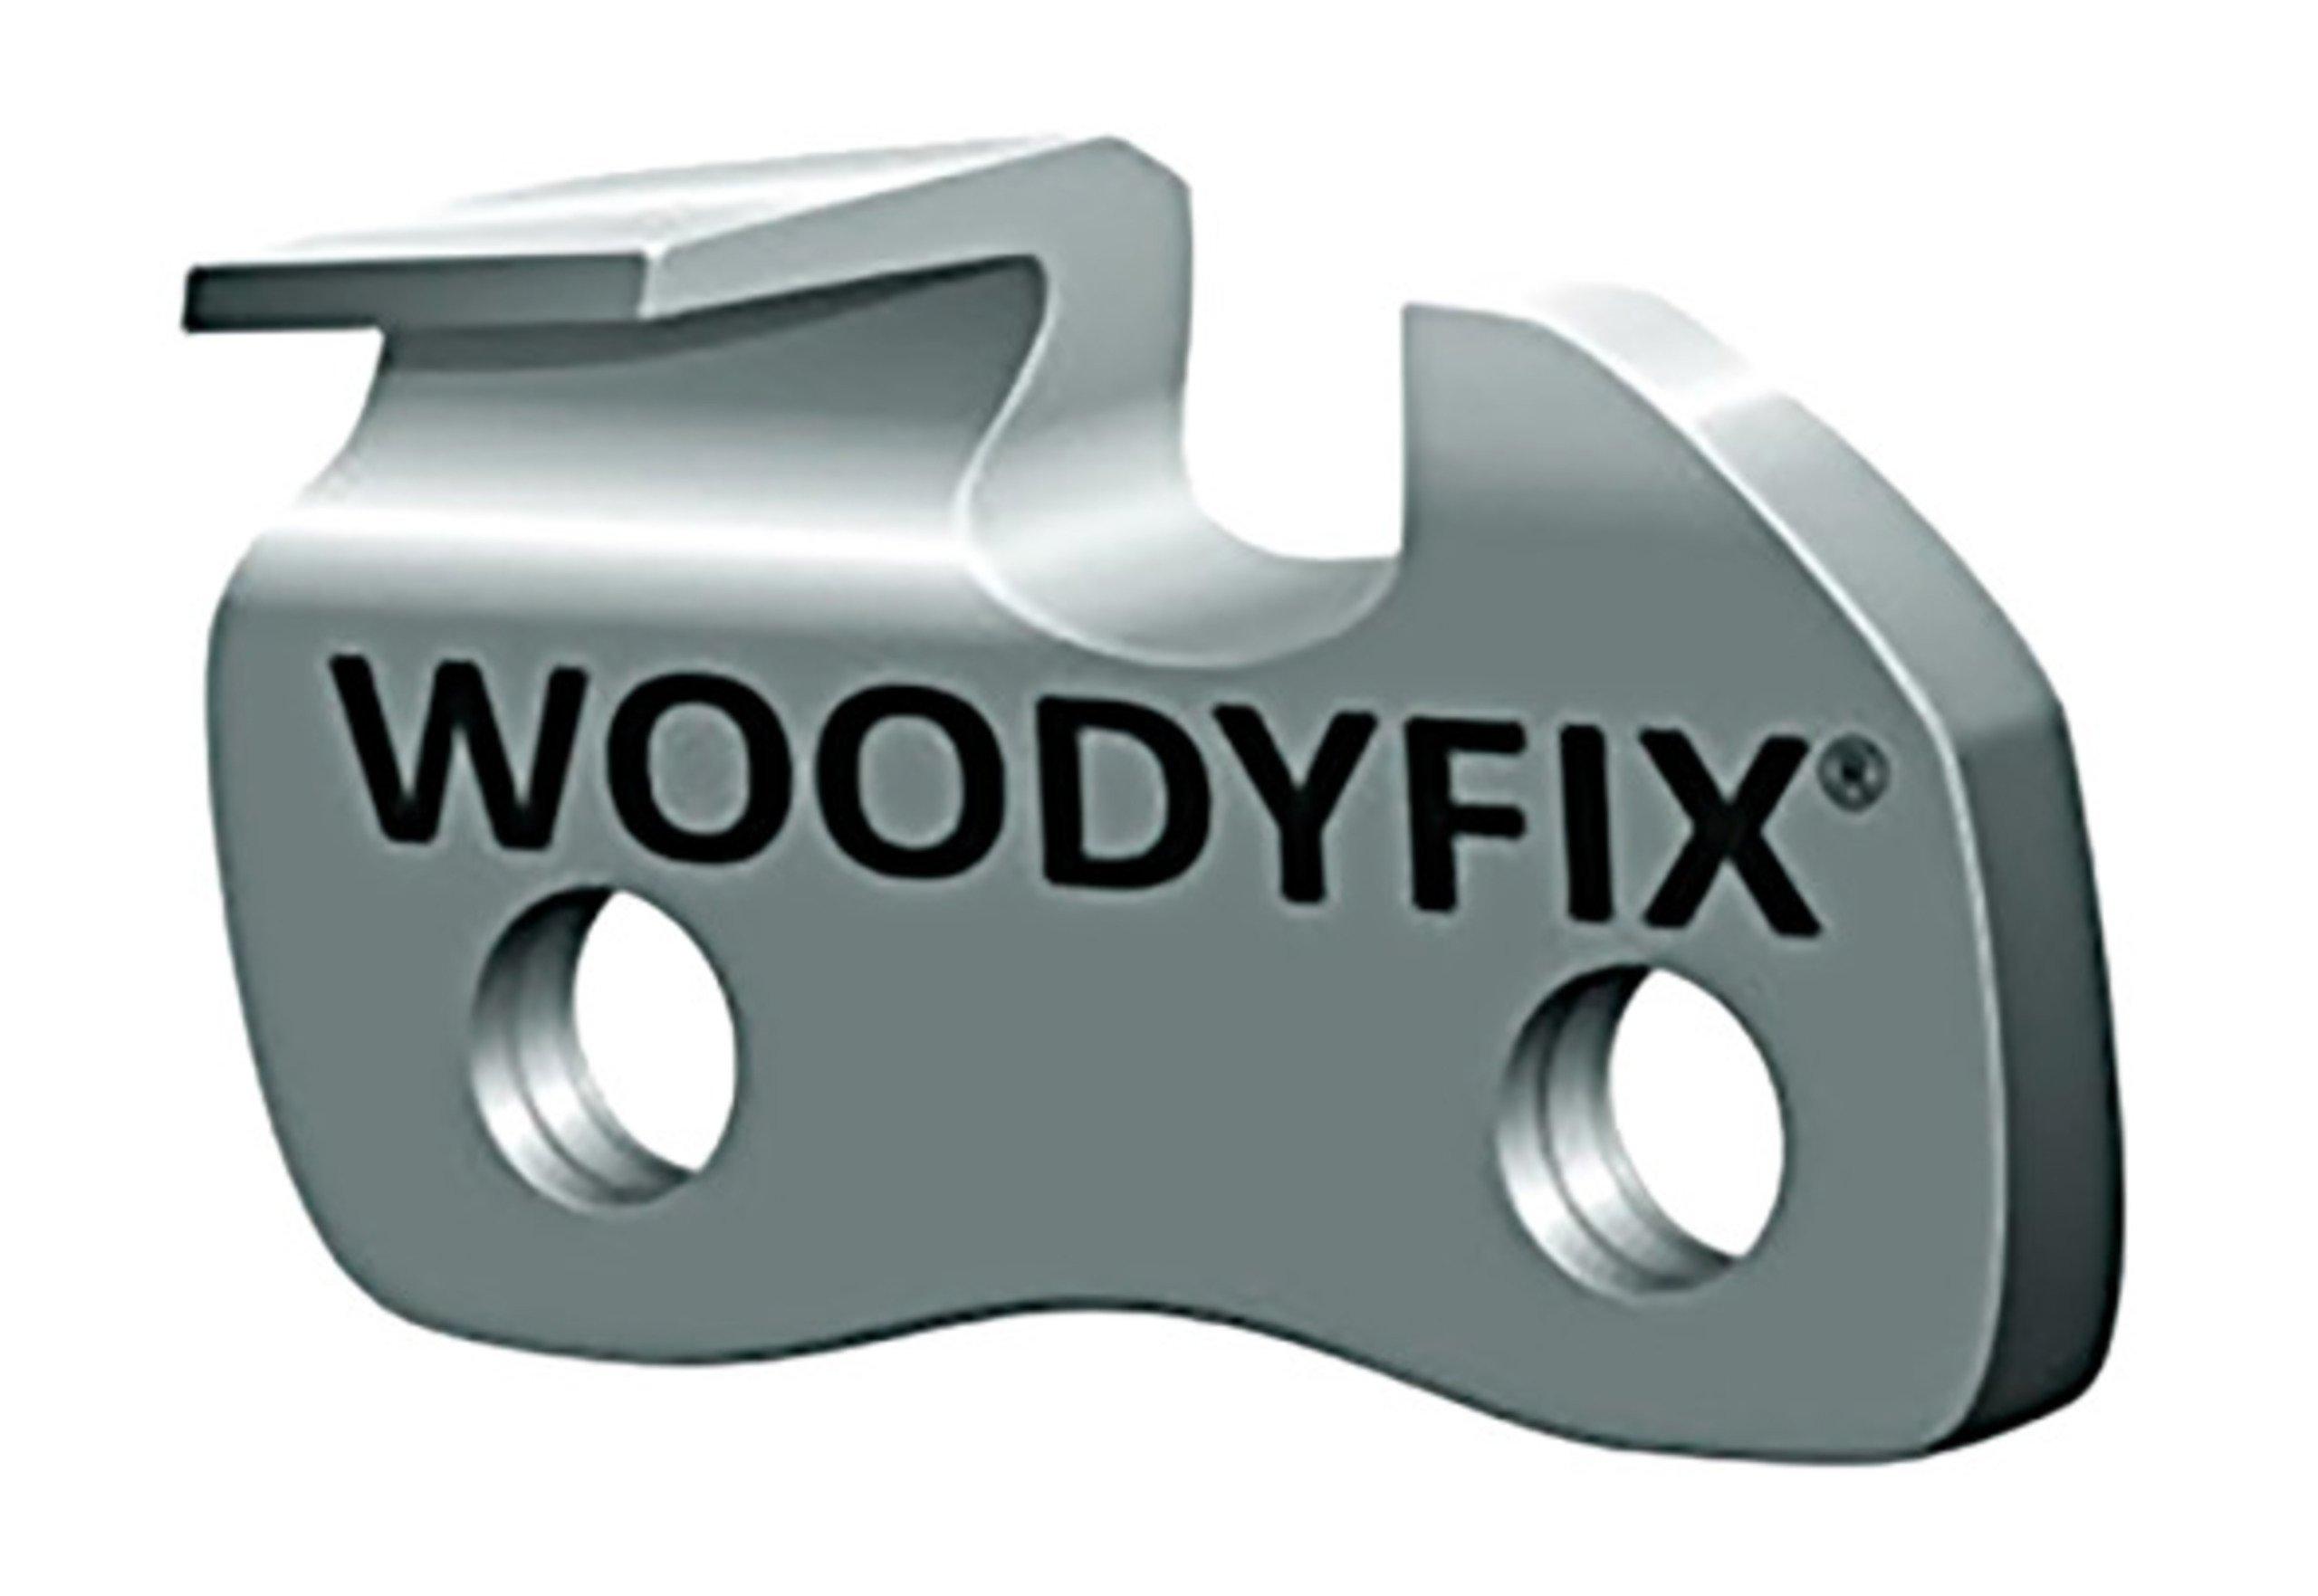 Woodyfix